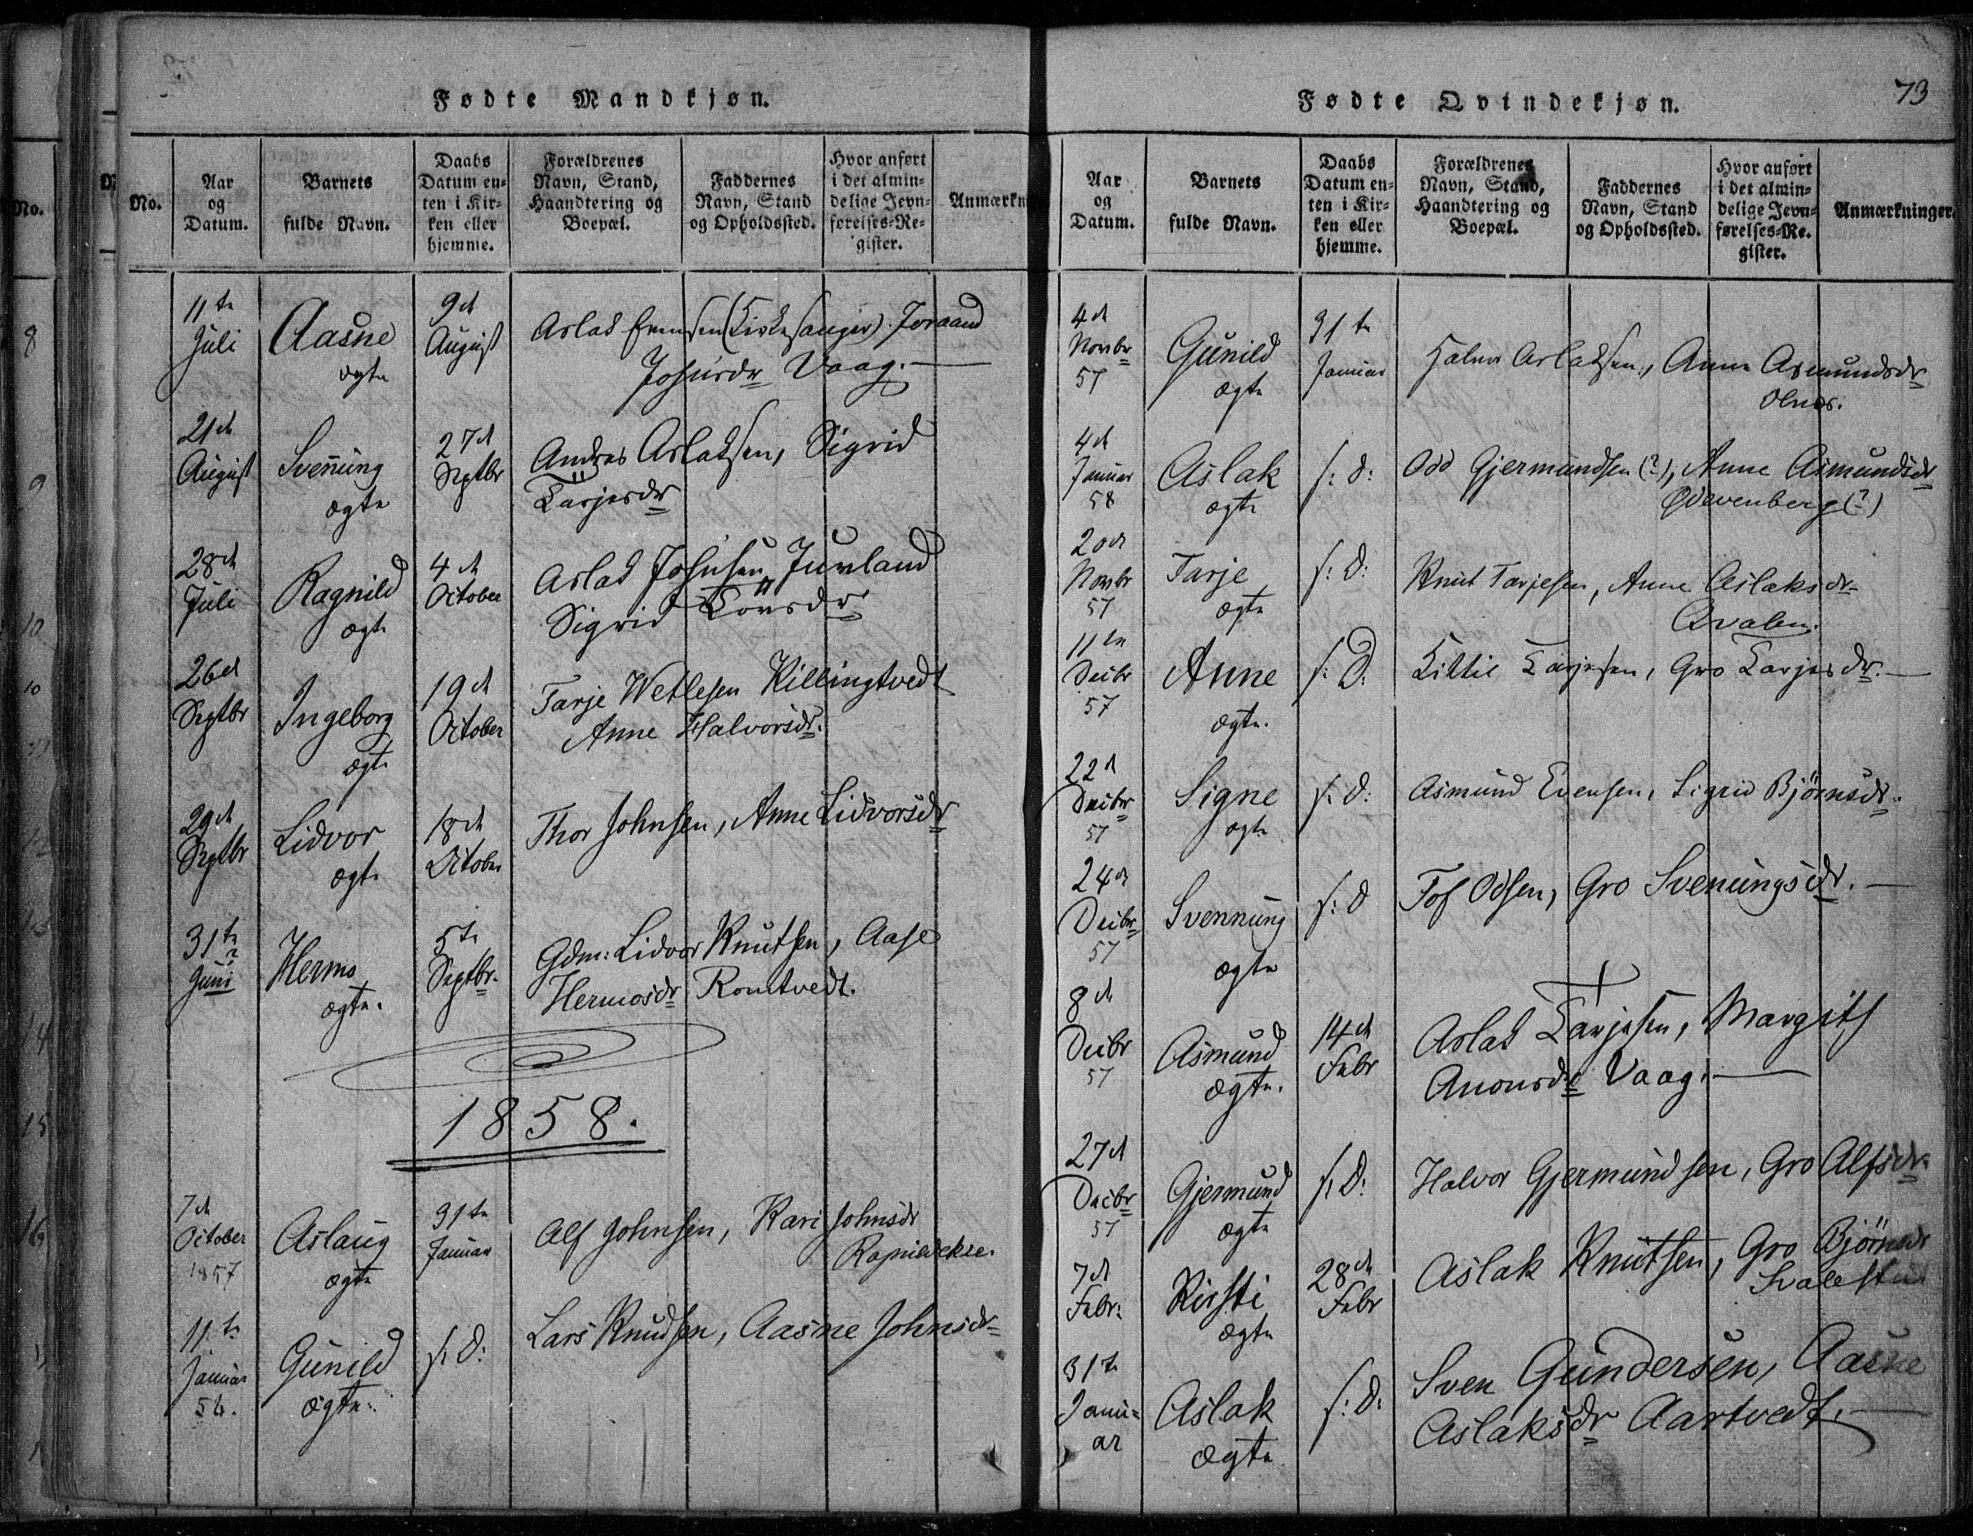 SAKO, Rauland kirkebøker, F/Fa/L0001: Ministerialbok nr. 1, 1814-1859, s. 73